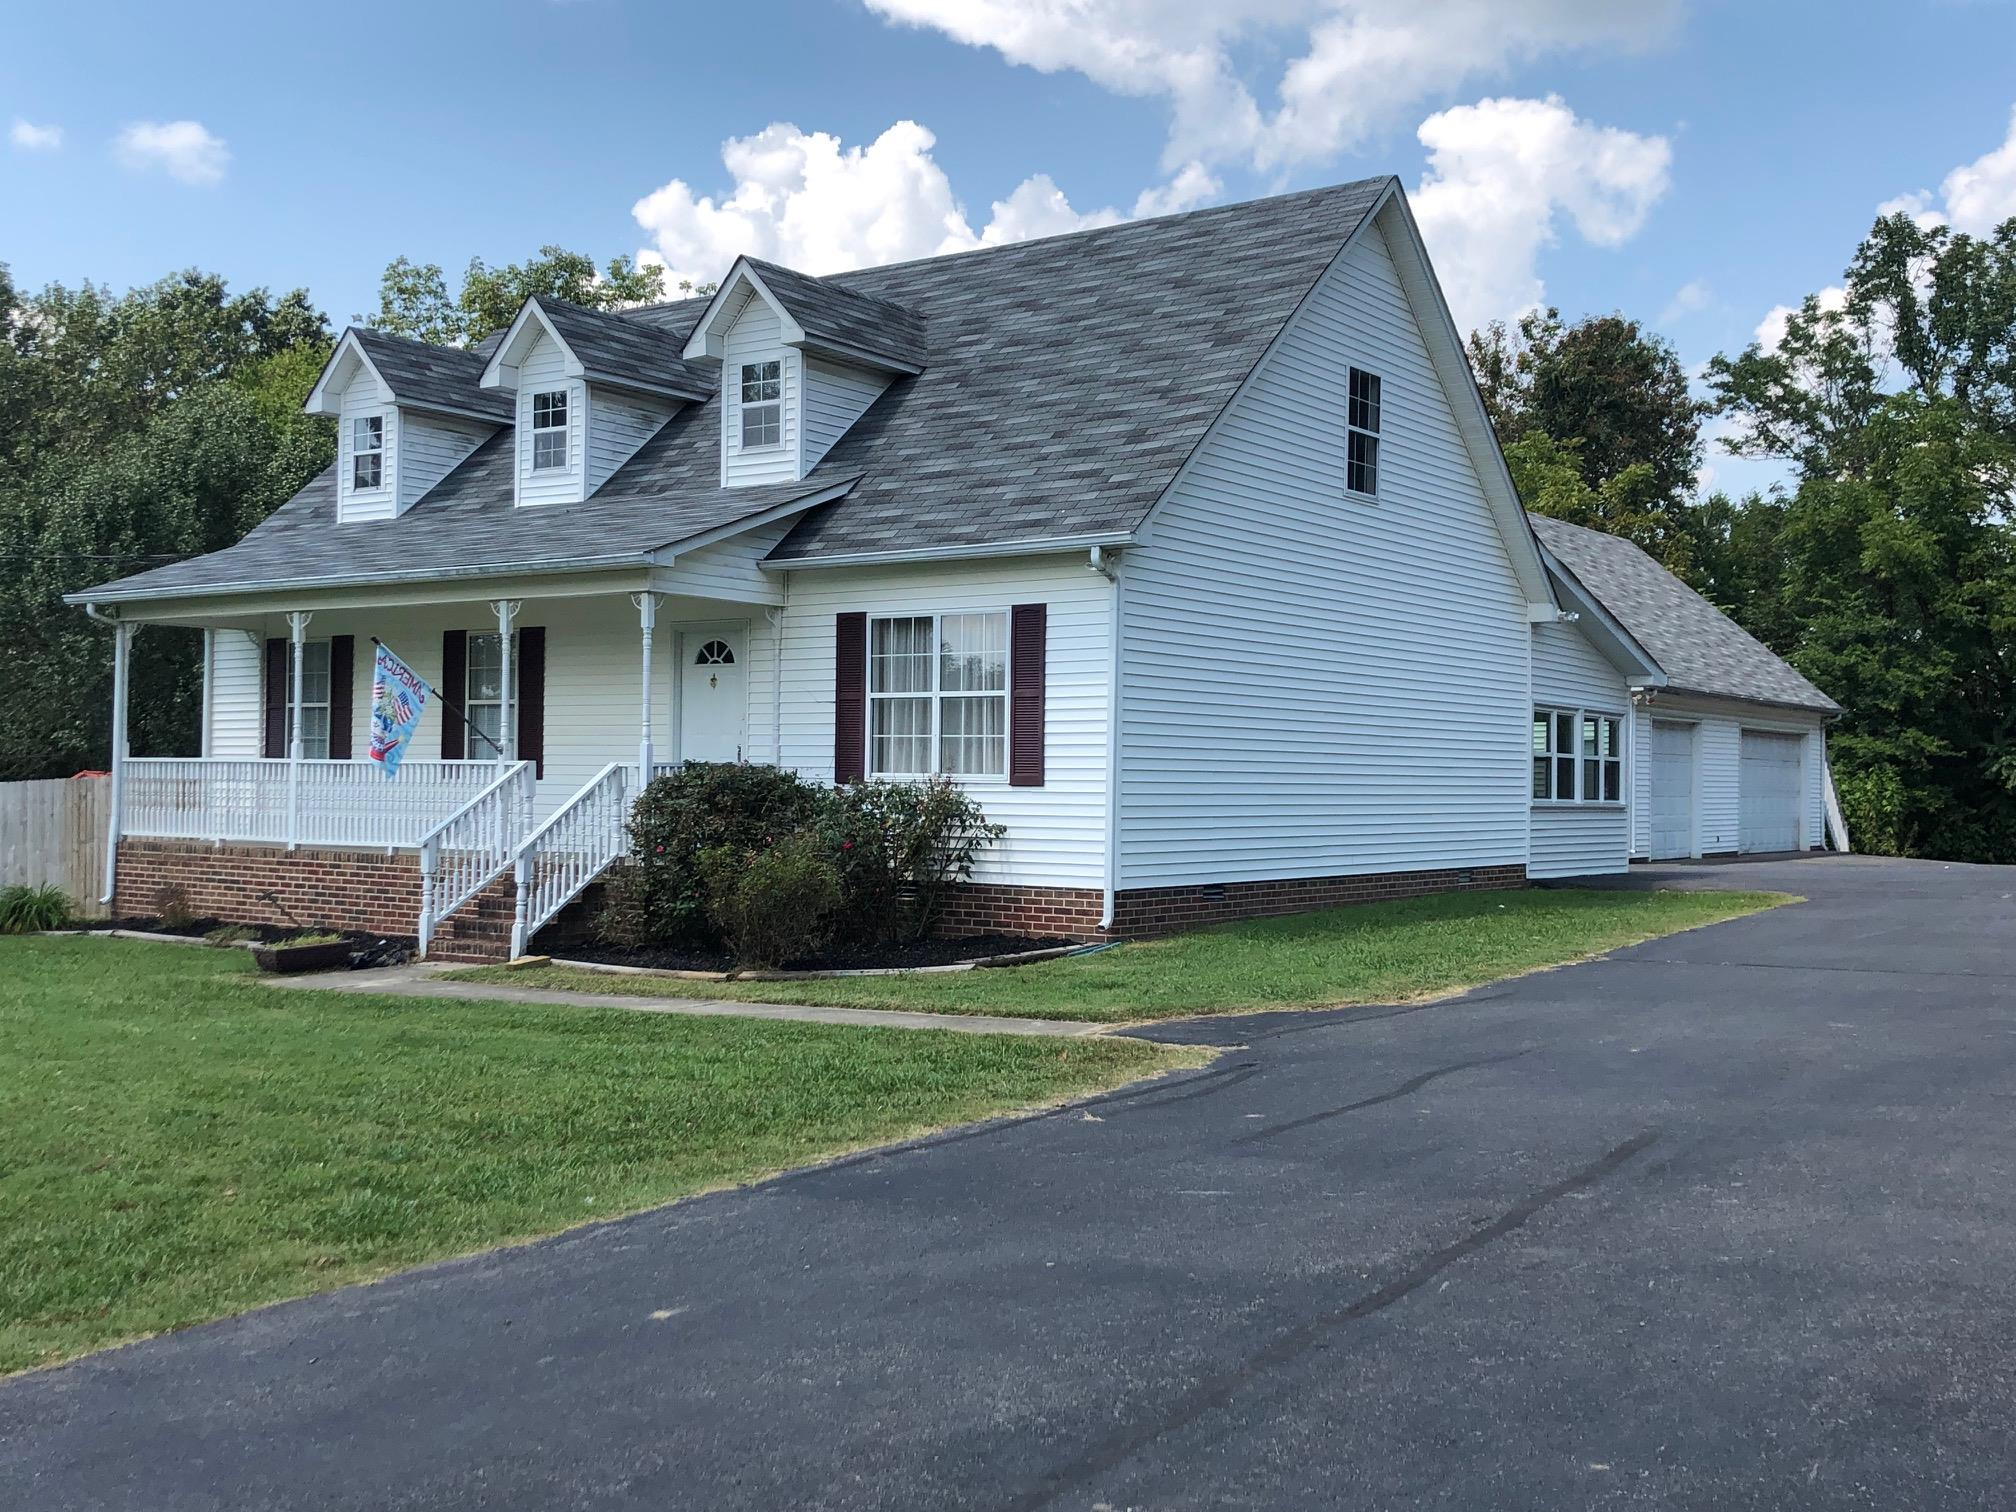 300 Woodland Dr, Shelbyville, TN 37160 - Shelbyville, TN real estate listing